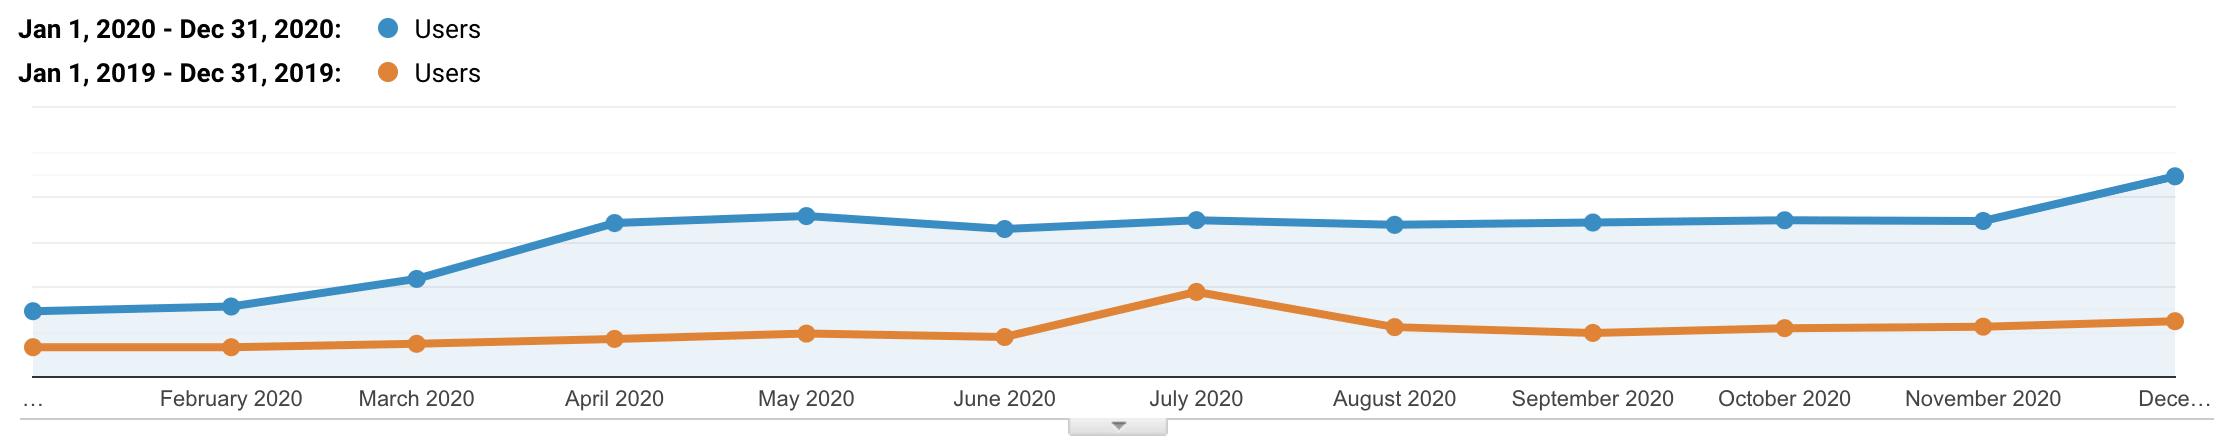 Kinstaのオーガニックトラフィック─2019年と2020年の比較